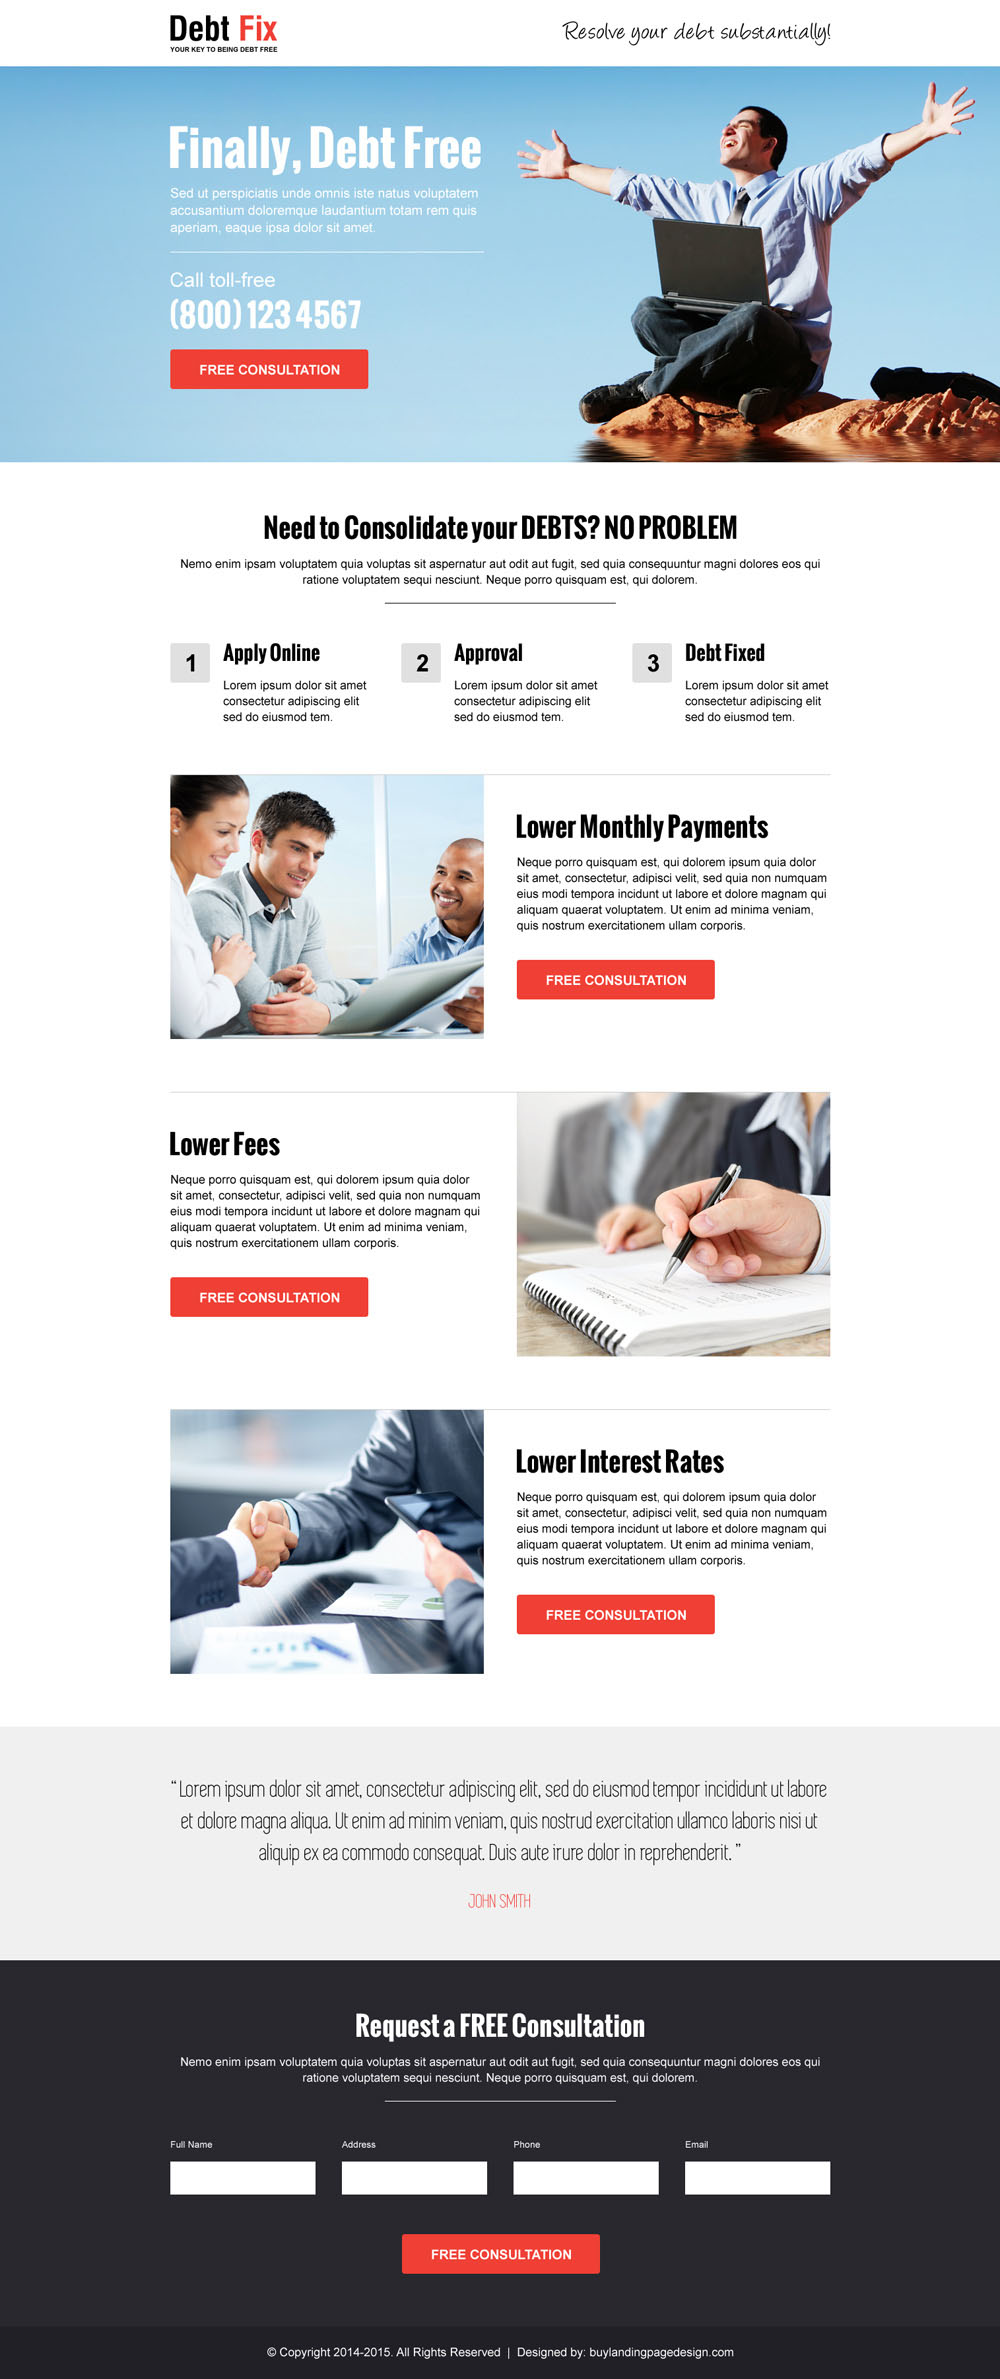 consolidate-your-debts-cta-lead-capture-landing-page-design-template-038